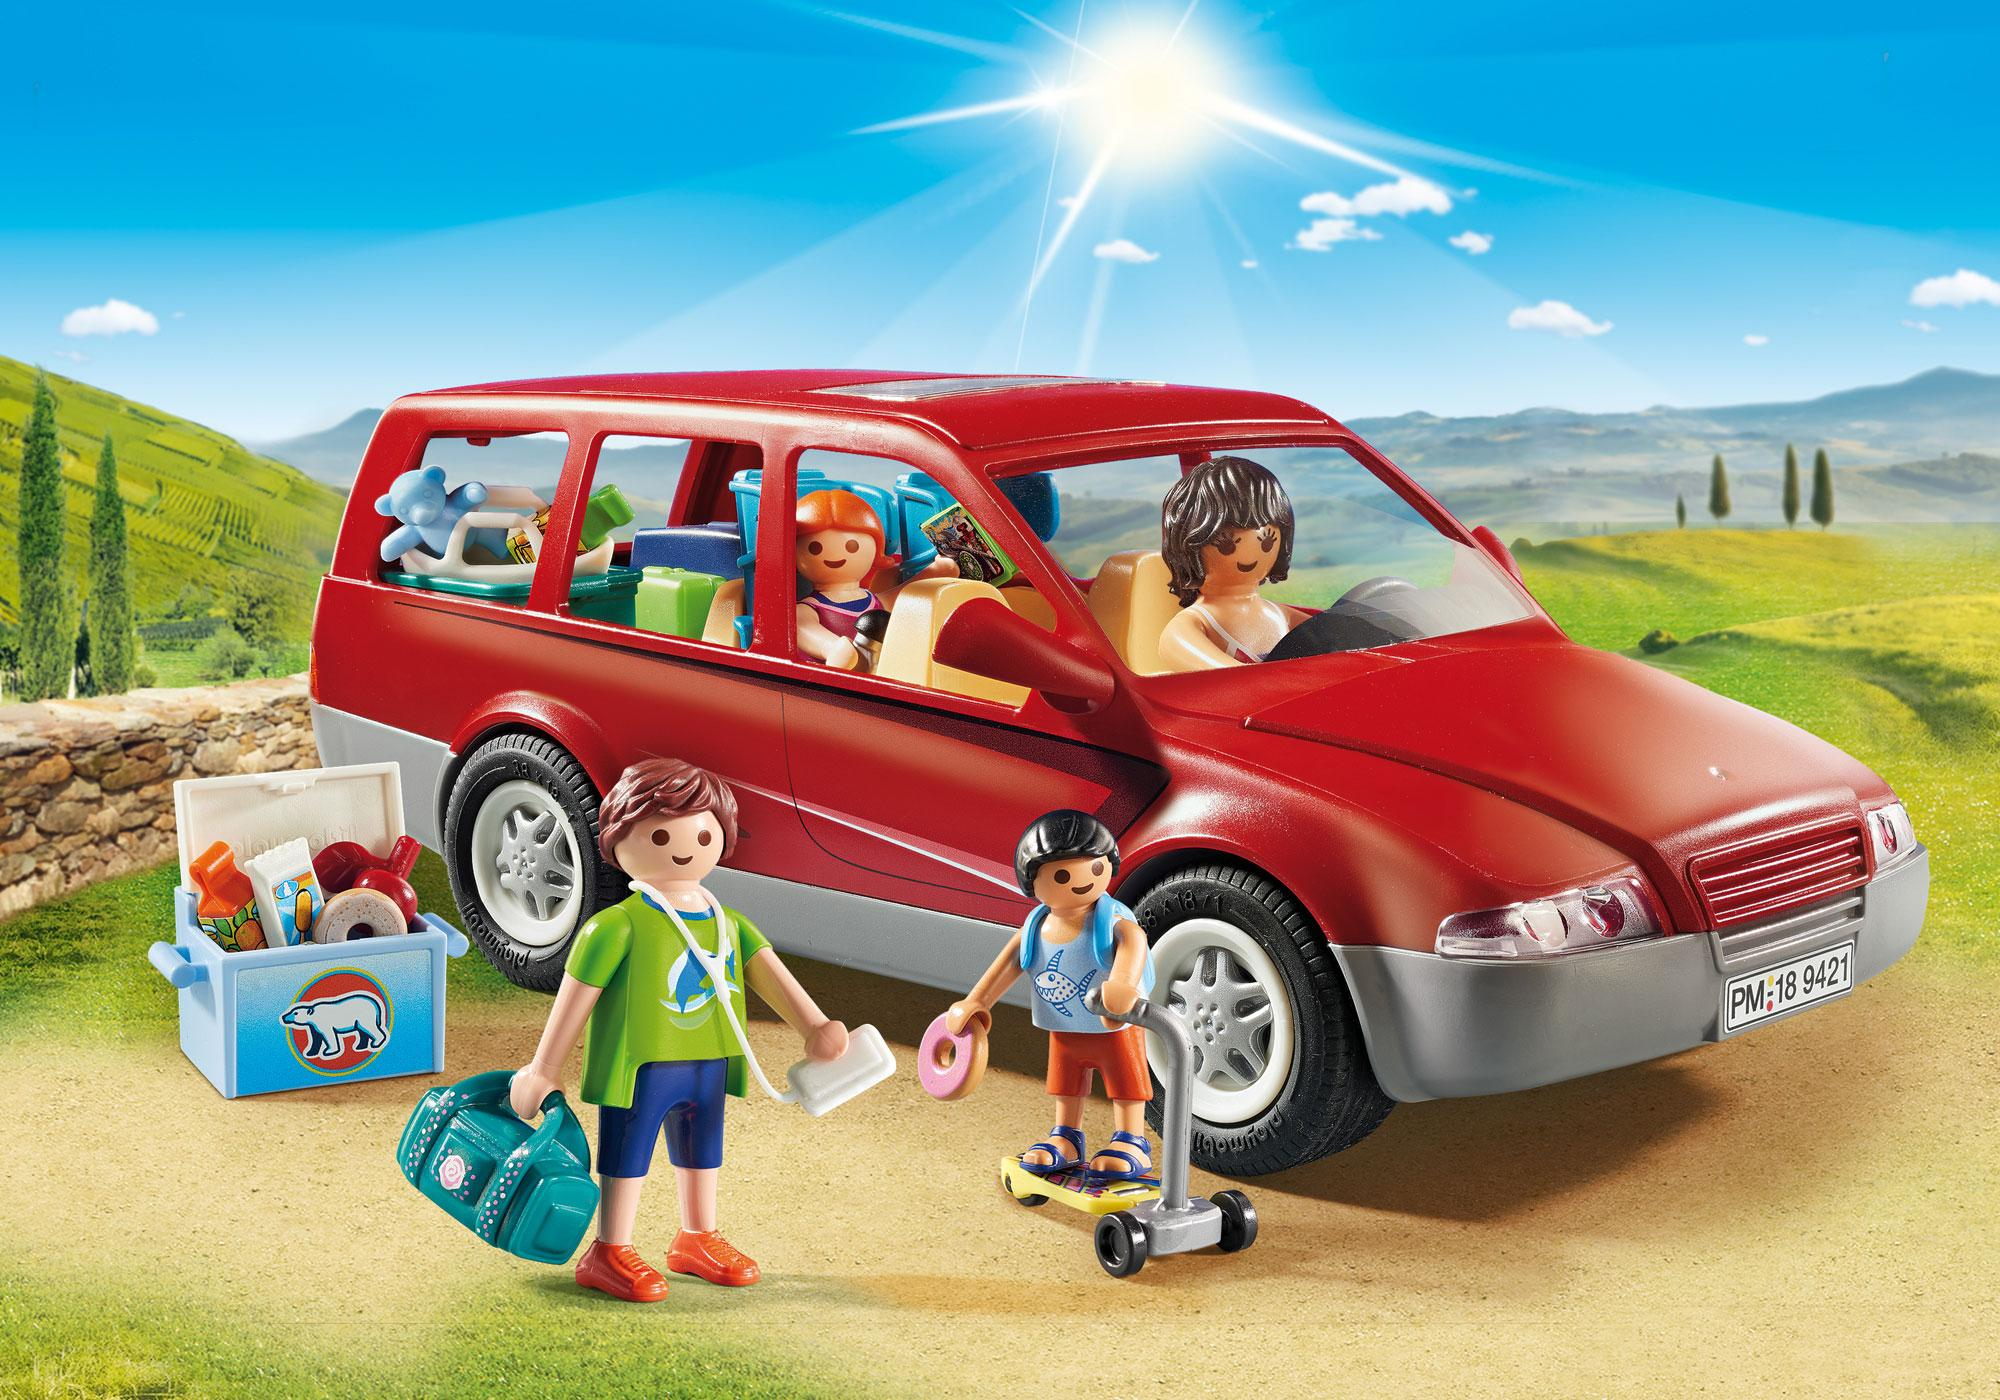 9421_product_detail/Famille avec voiture